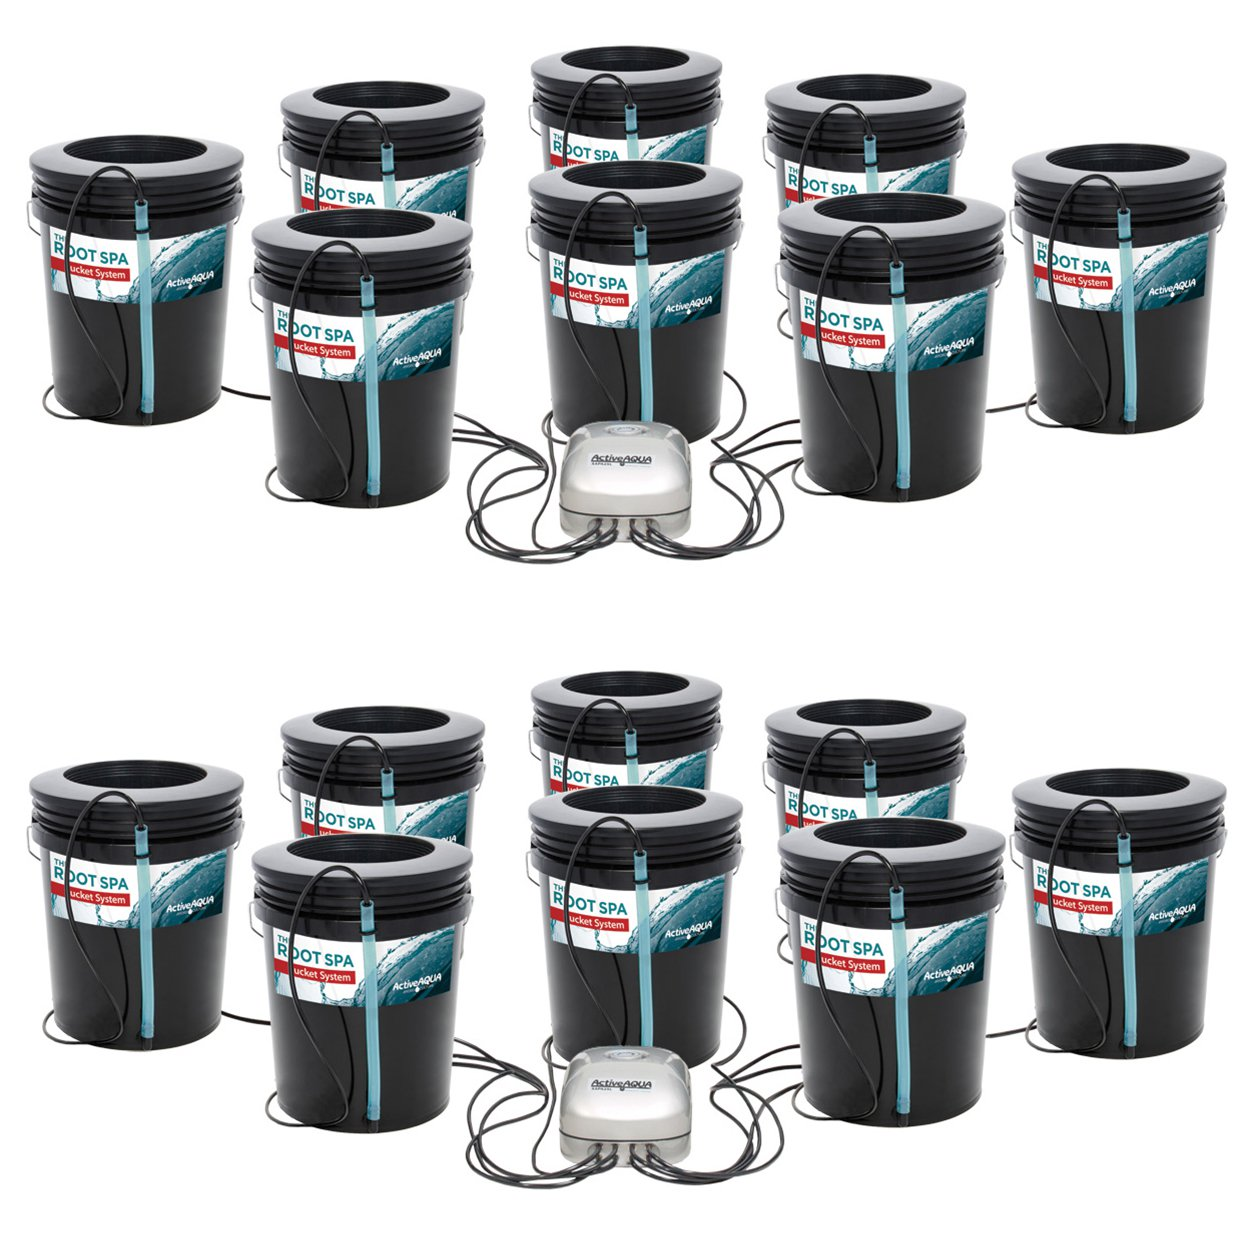 Active Aqua Root Spa 5-Gallon 8-Bucket Deep Water Culture System (2 Pack)